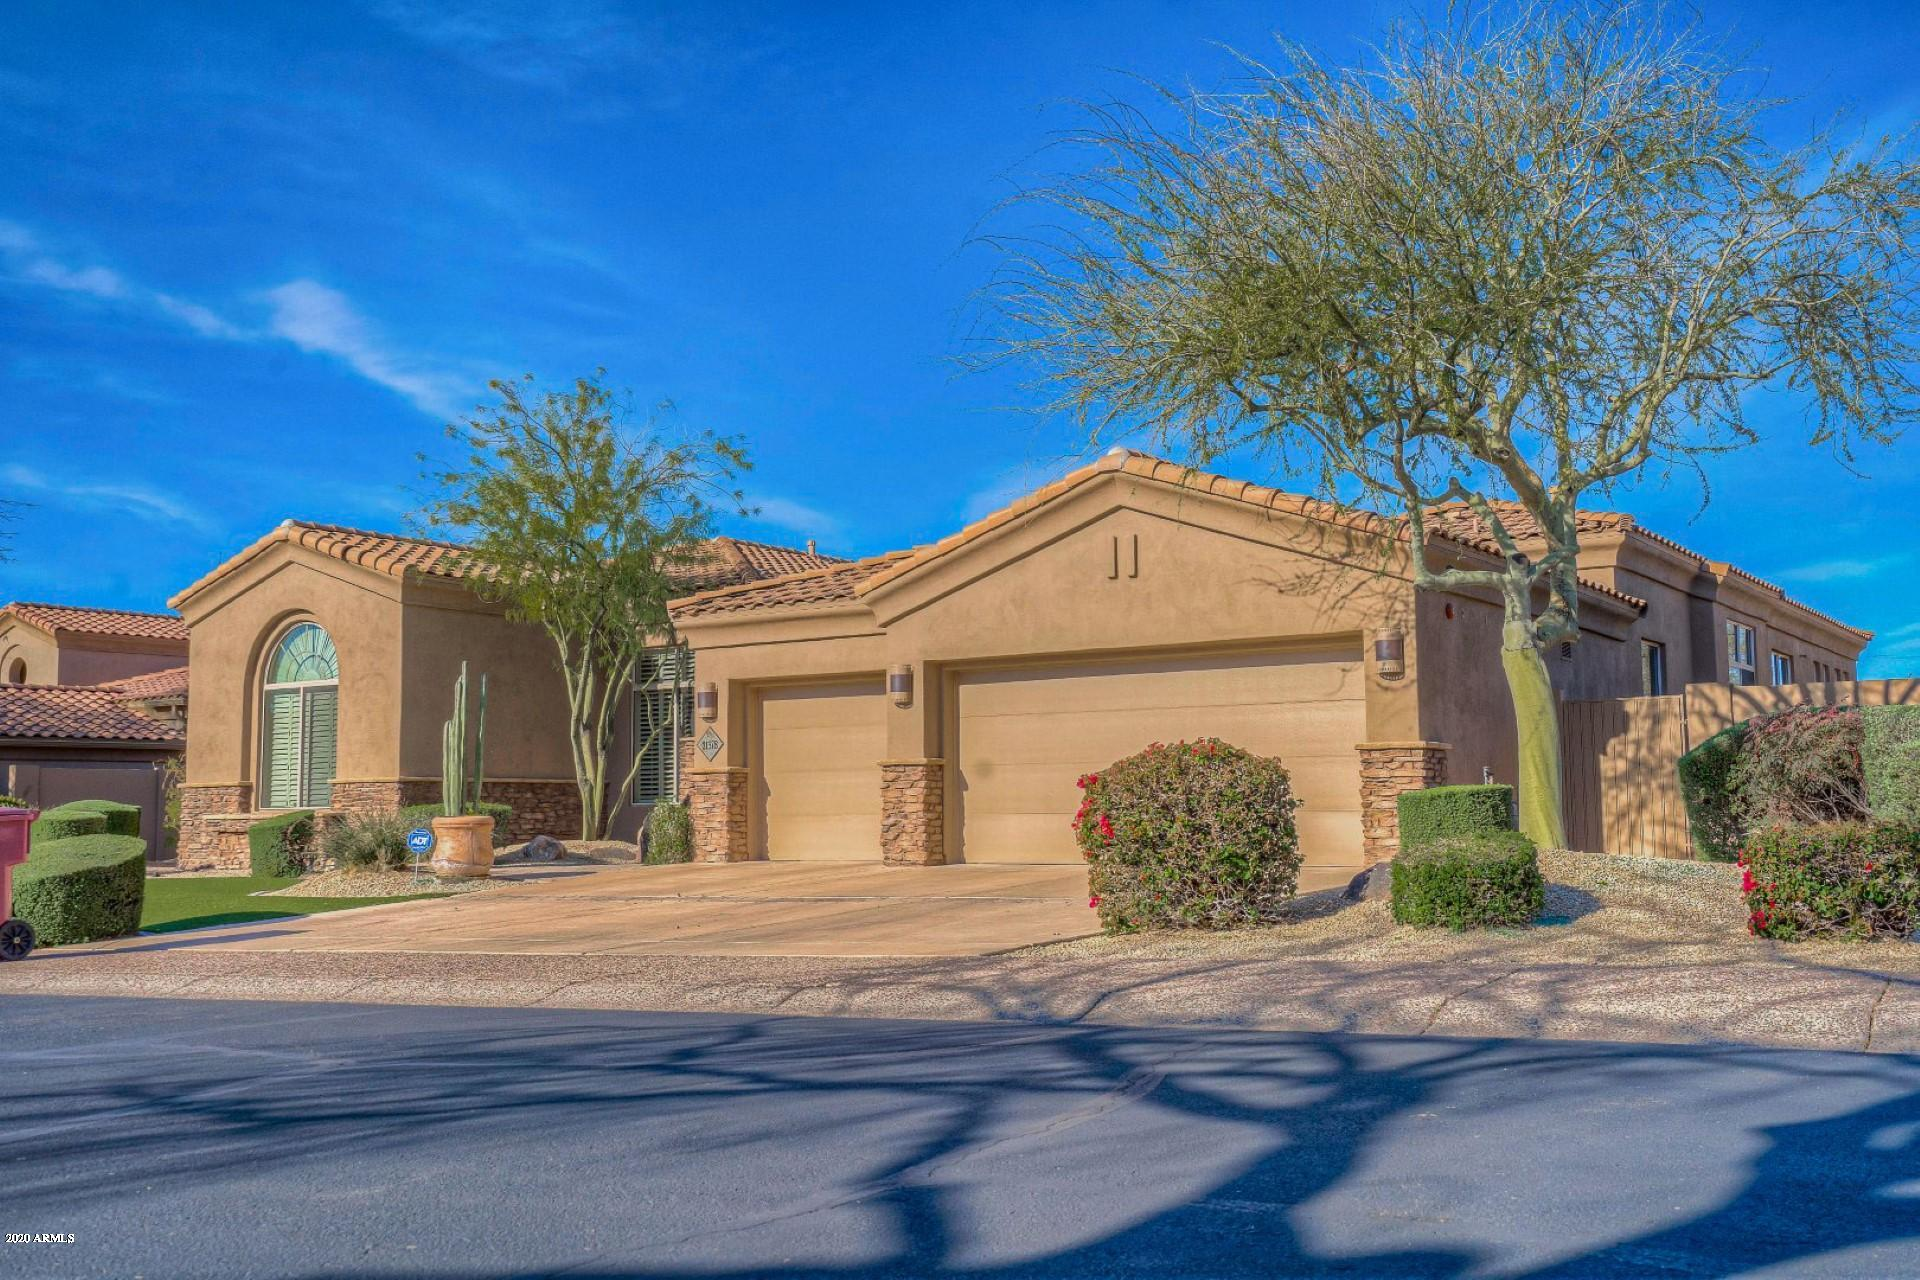 Photo of 21378 N 78th Street, Scottsdale, AZ 85255